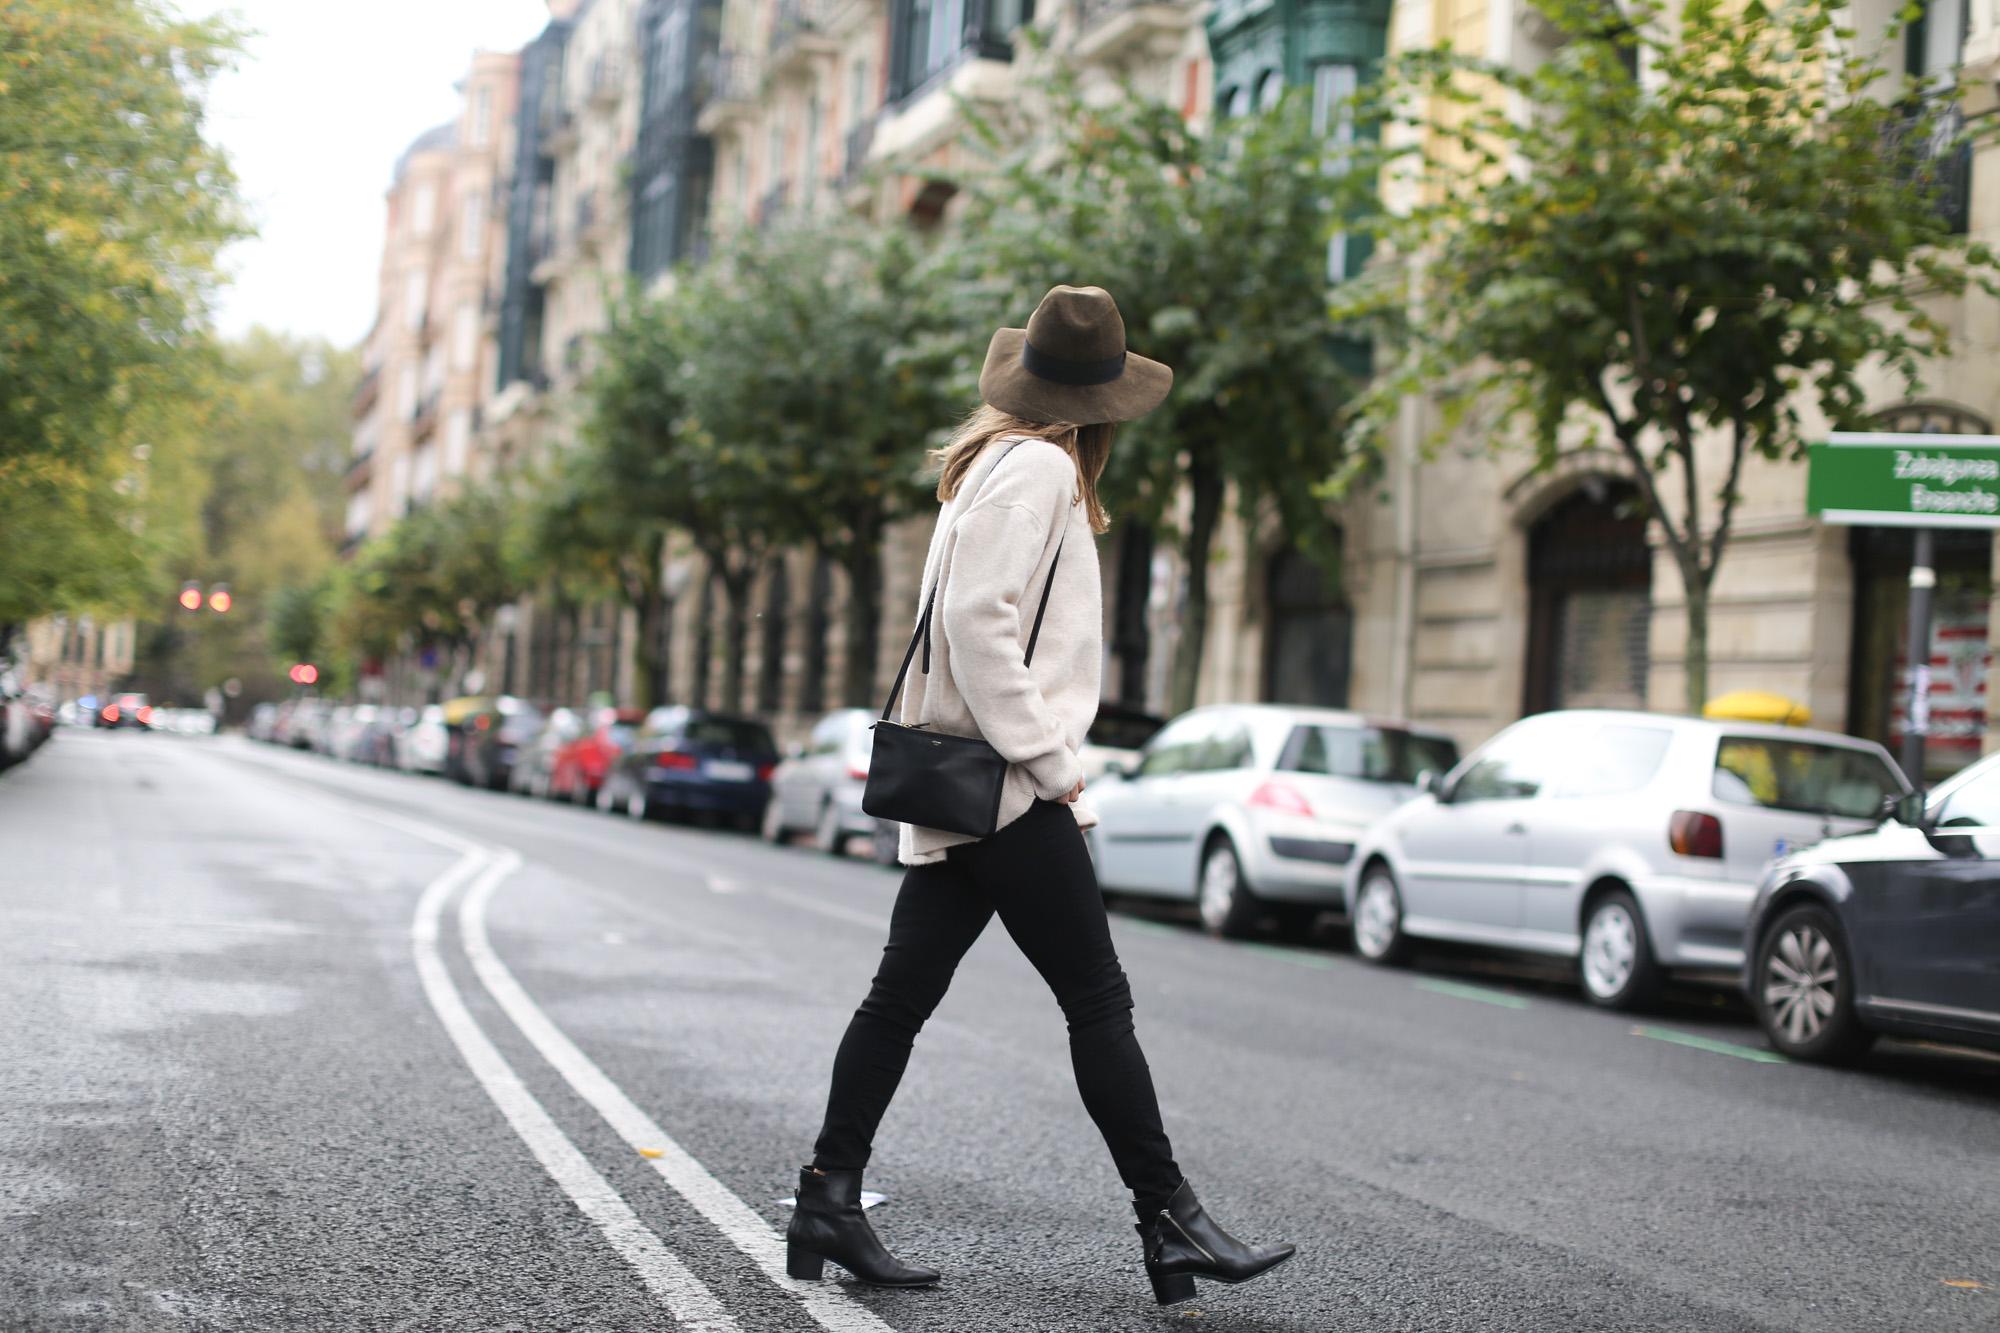 Clochet-streetstyle-celine-trio-bag-zara-oversized-knit-fedora-hat-7